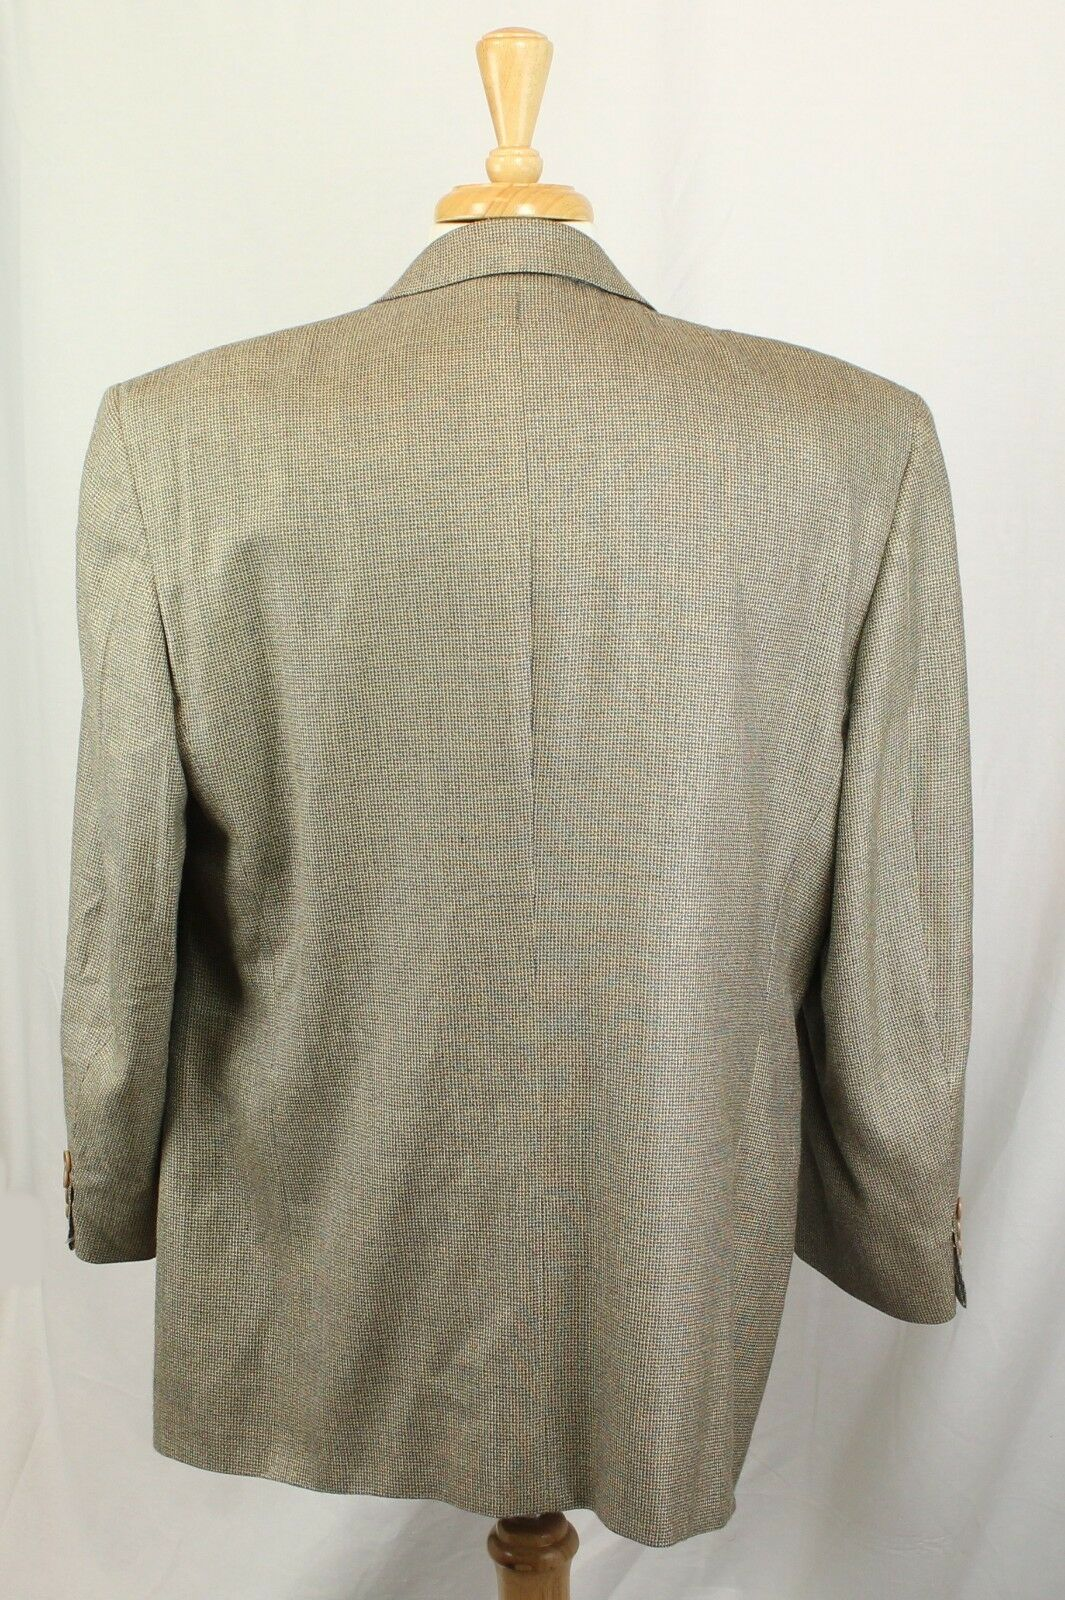 Canali Nailhead Silk Wool Blend Blend Blend Three Button No Vent Sport Coat EU 56R US 46R 69a910